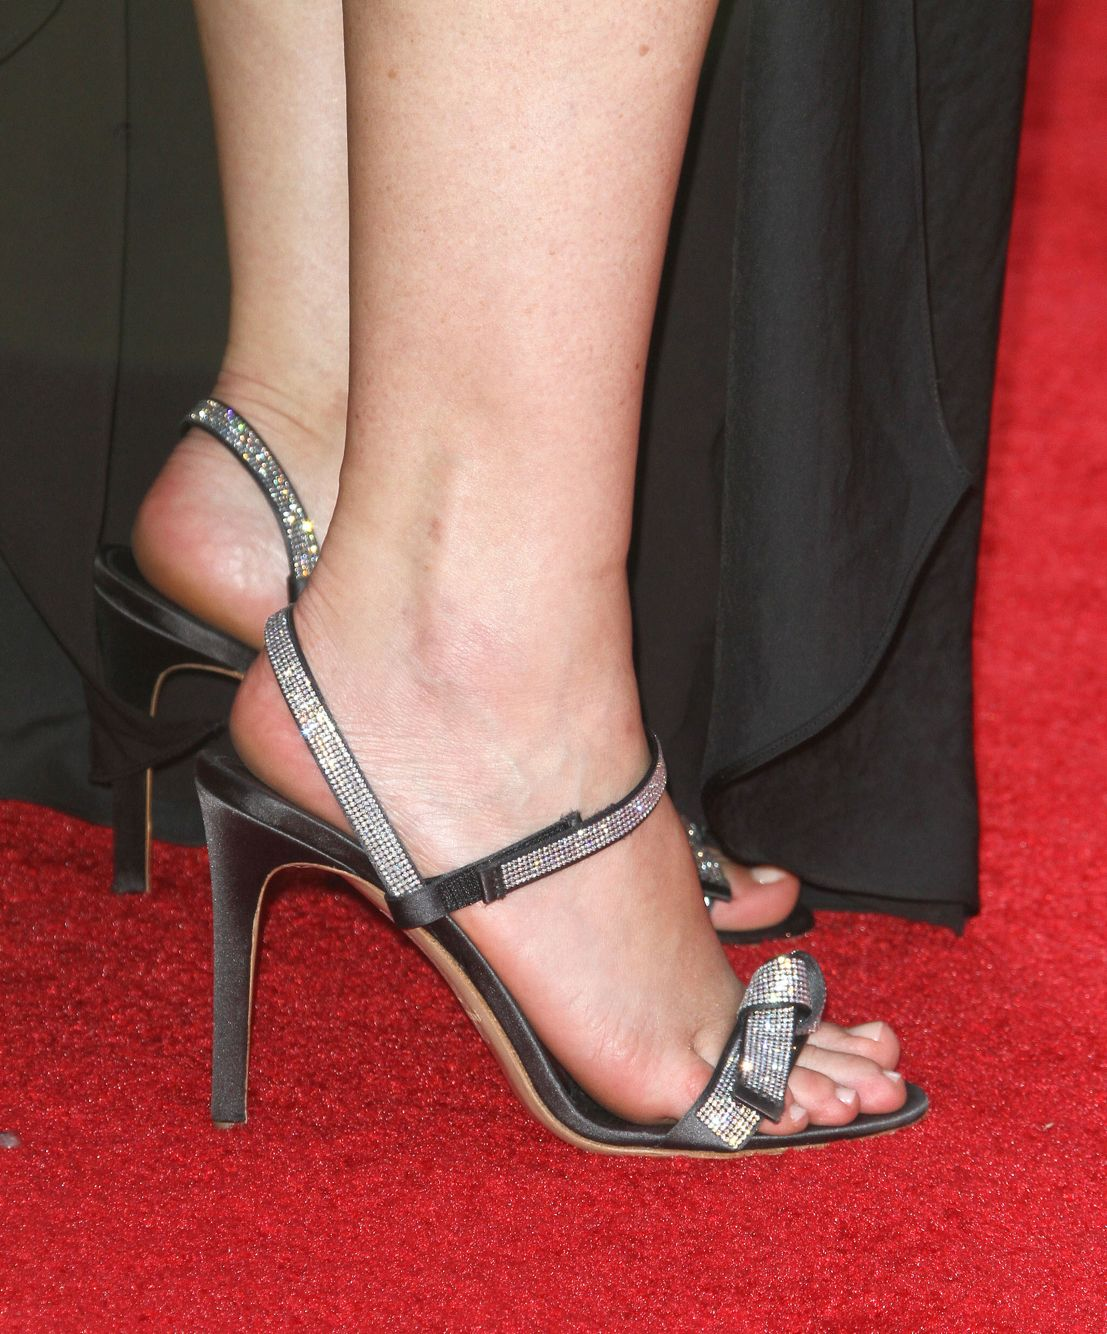 b7984bbecbc8 Evangeline Lilly s High Heels ...XoXo